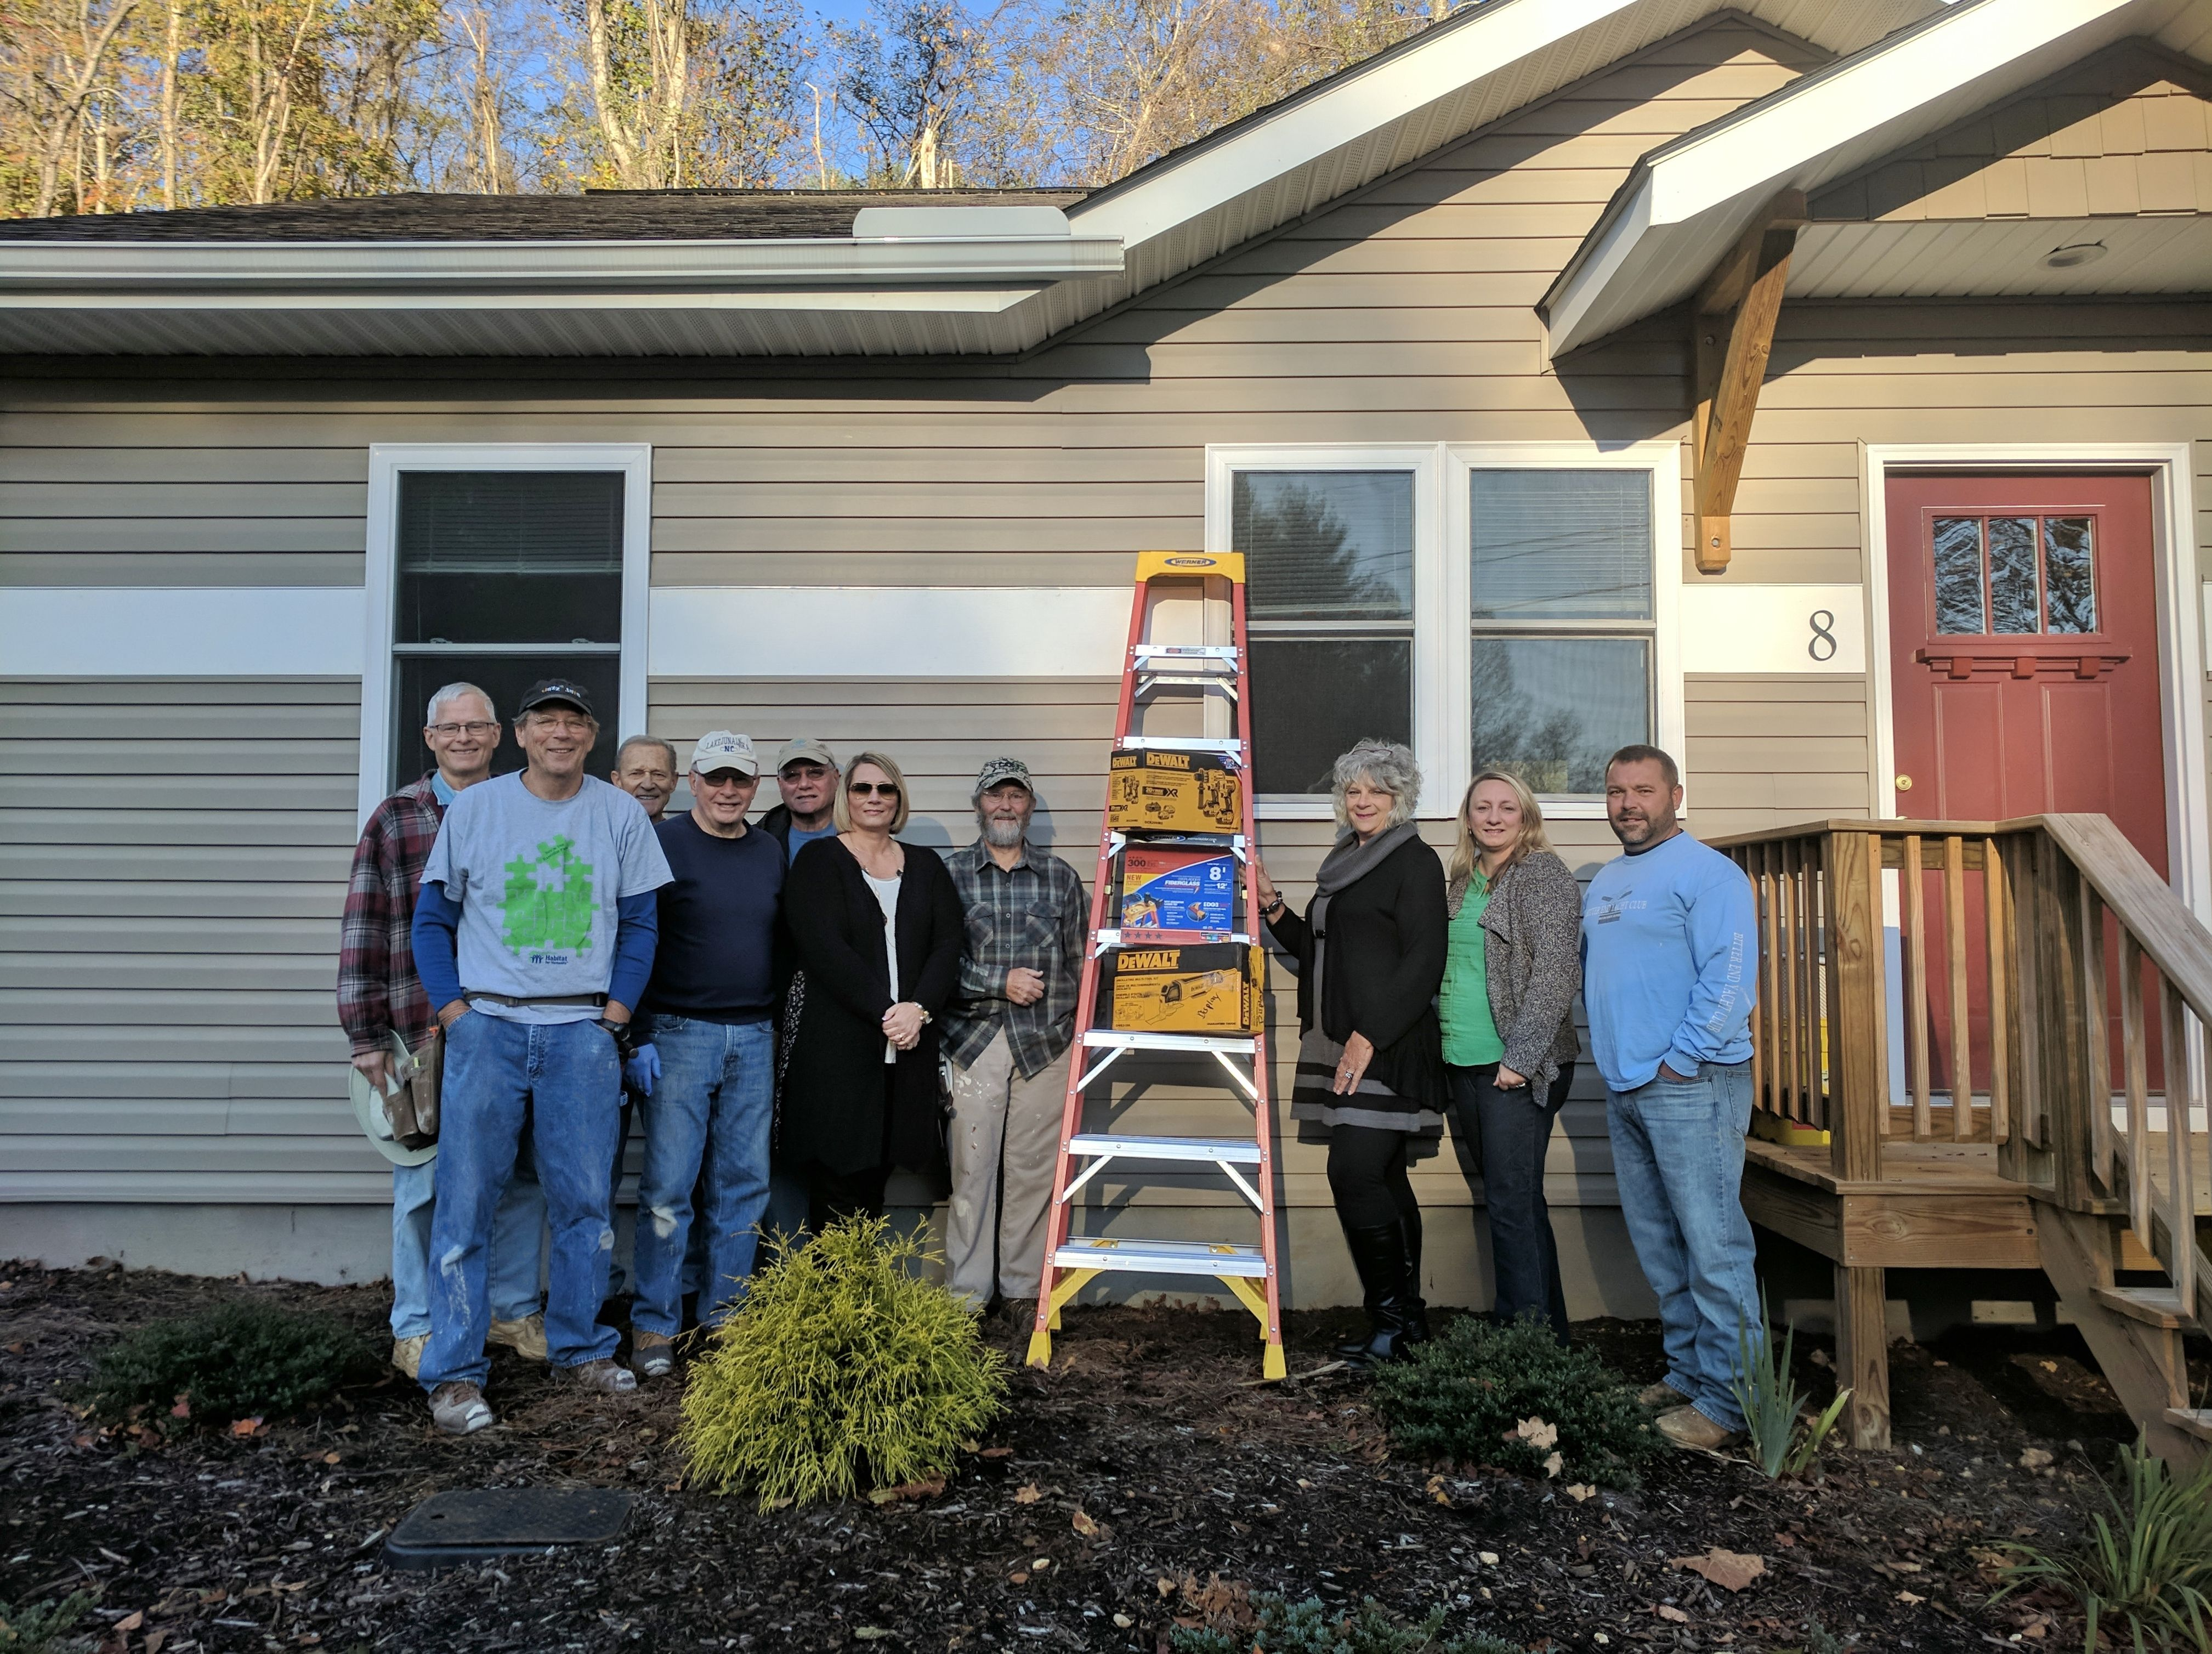 Family donates new construction equipment